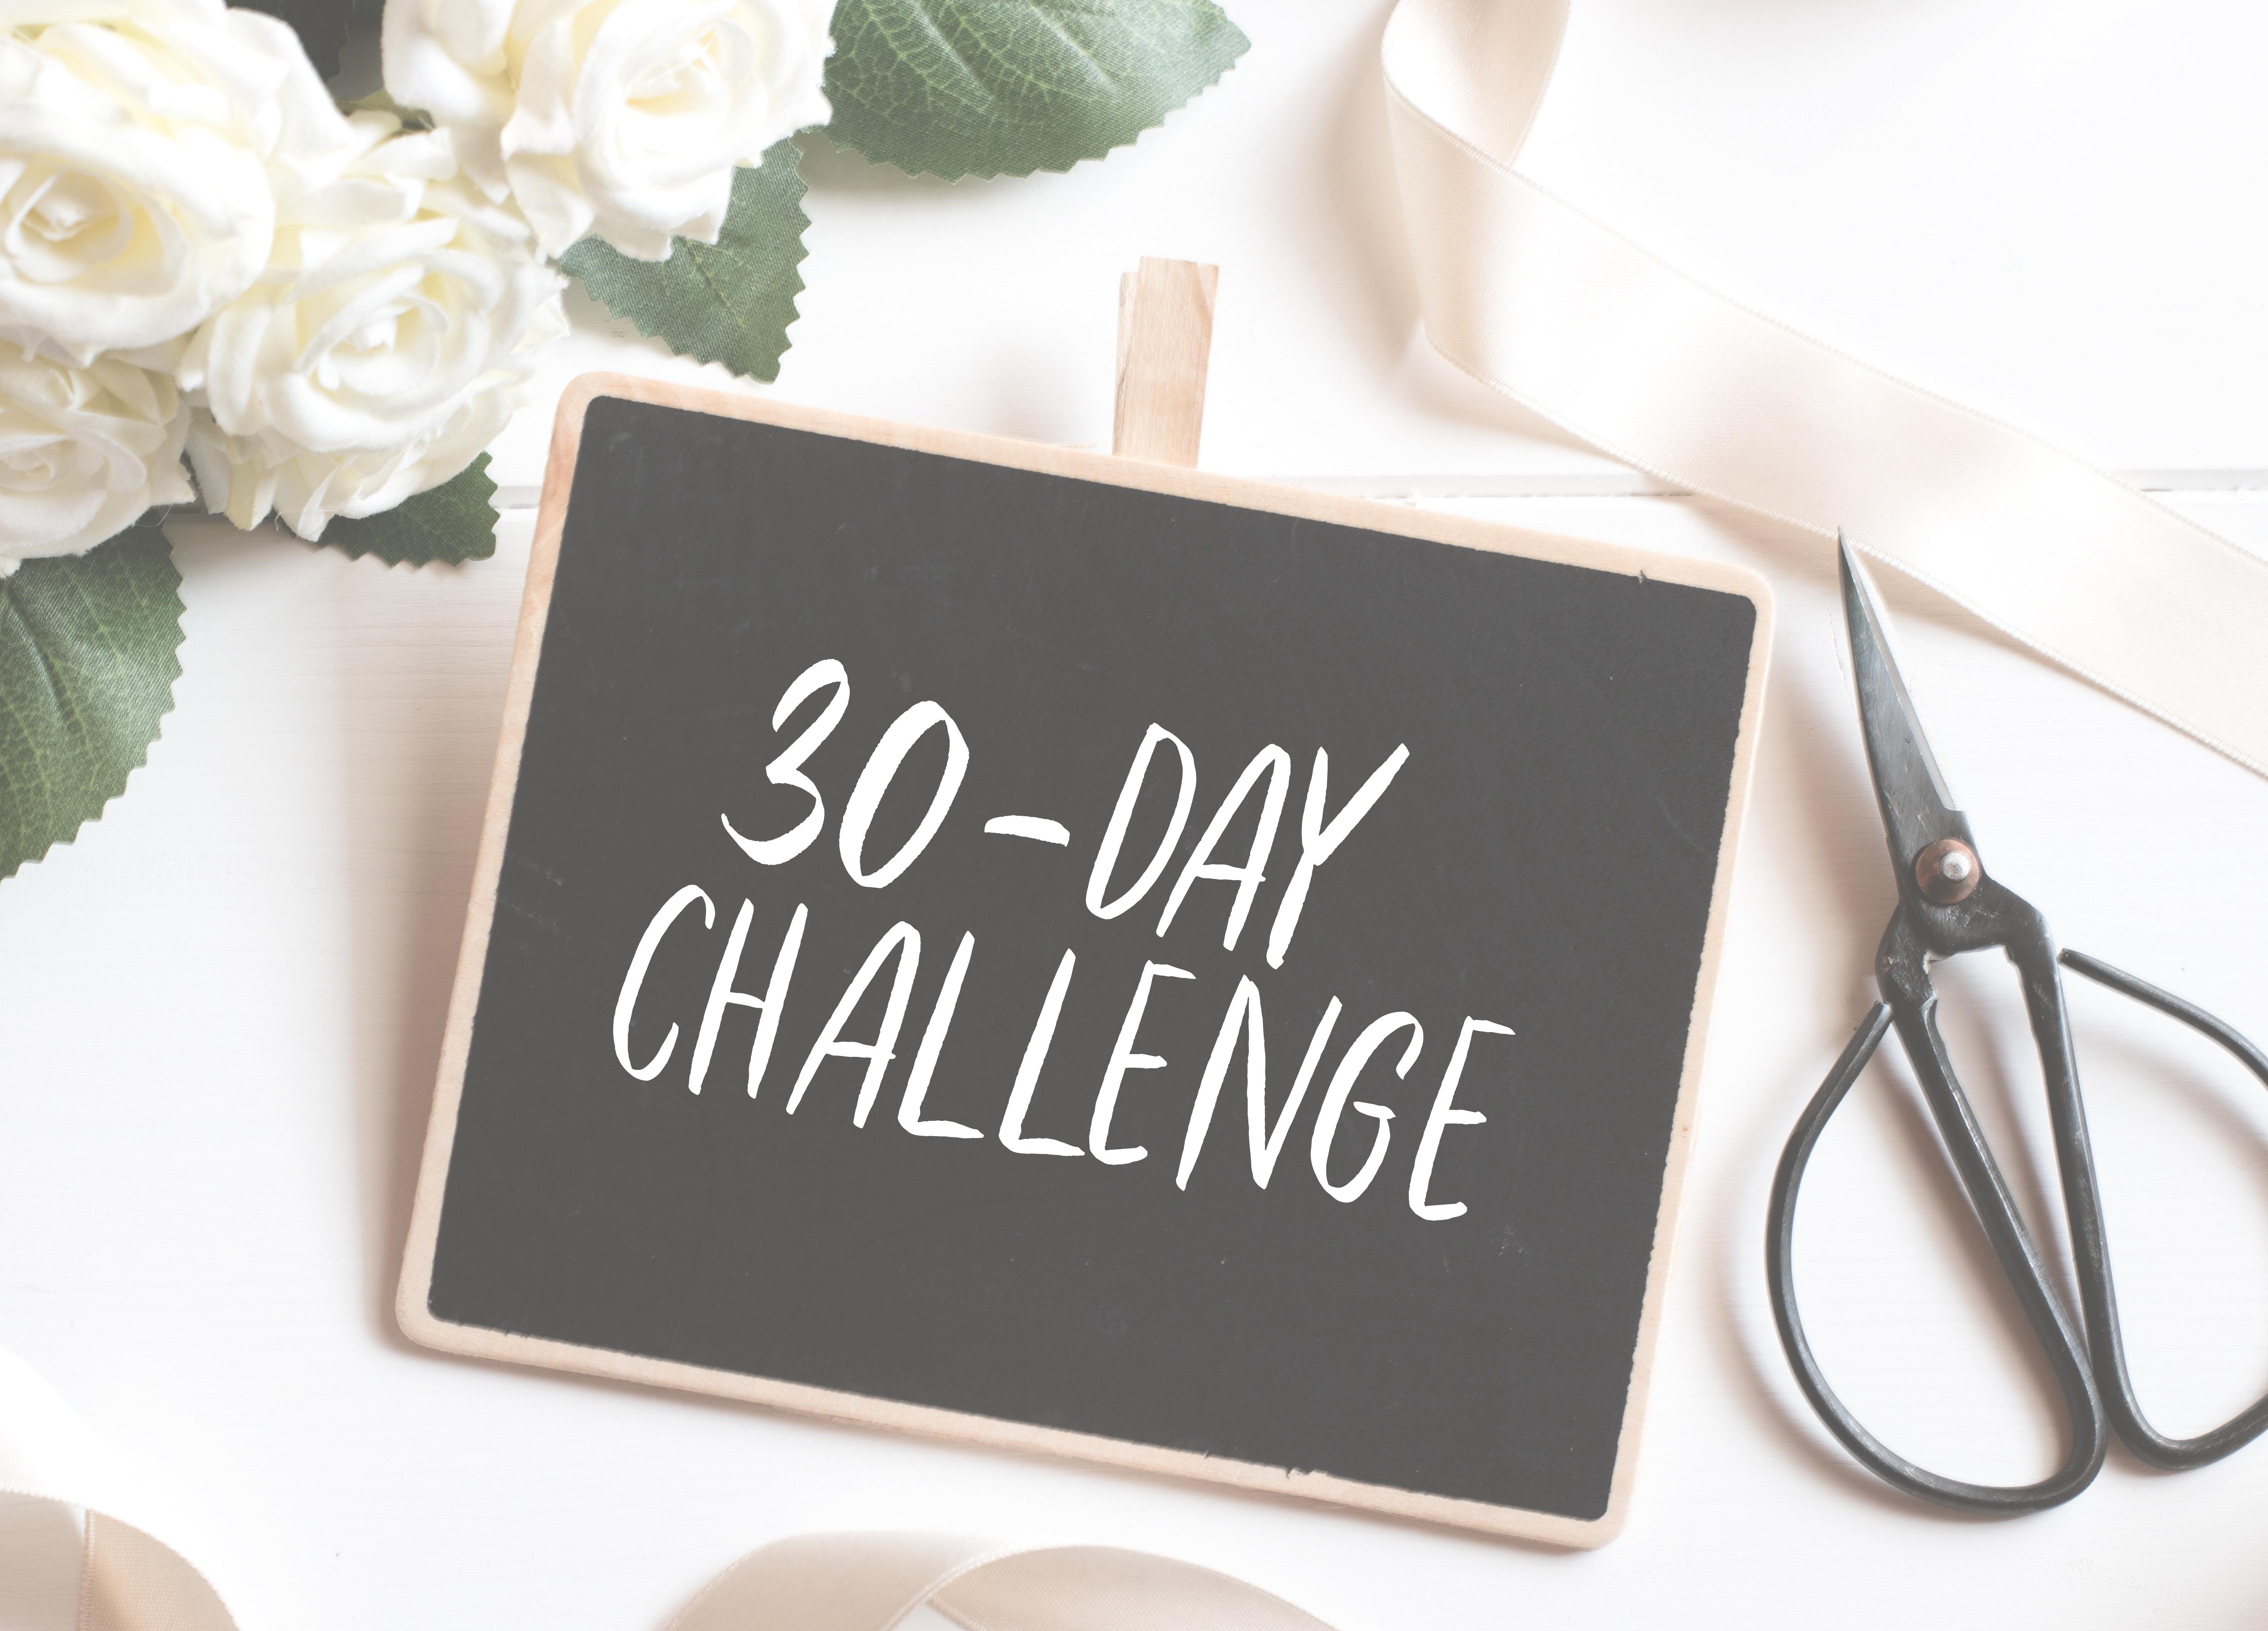 March 30-Day Mini Challenge